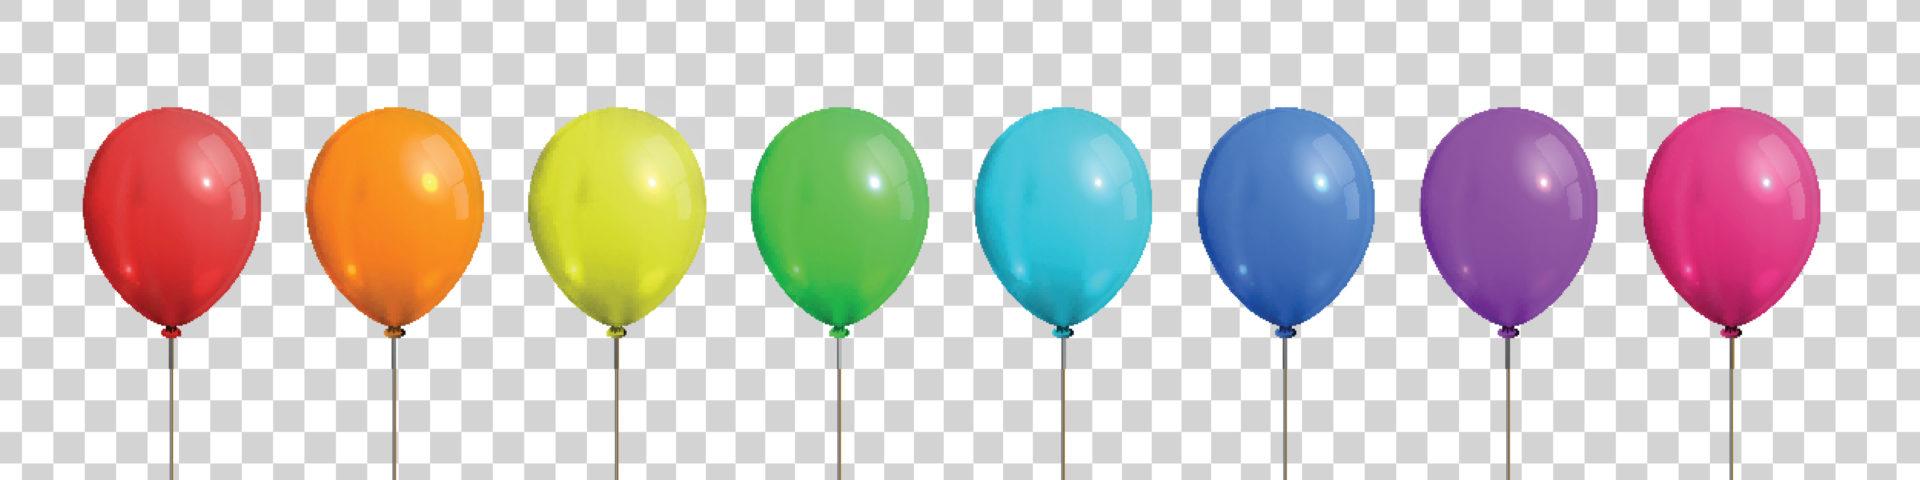 bunte luftballons Wir feiern Geburtstag